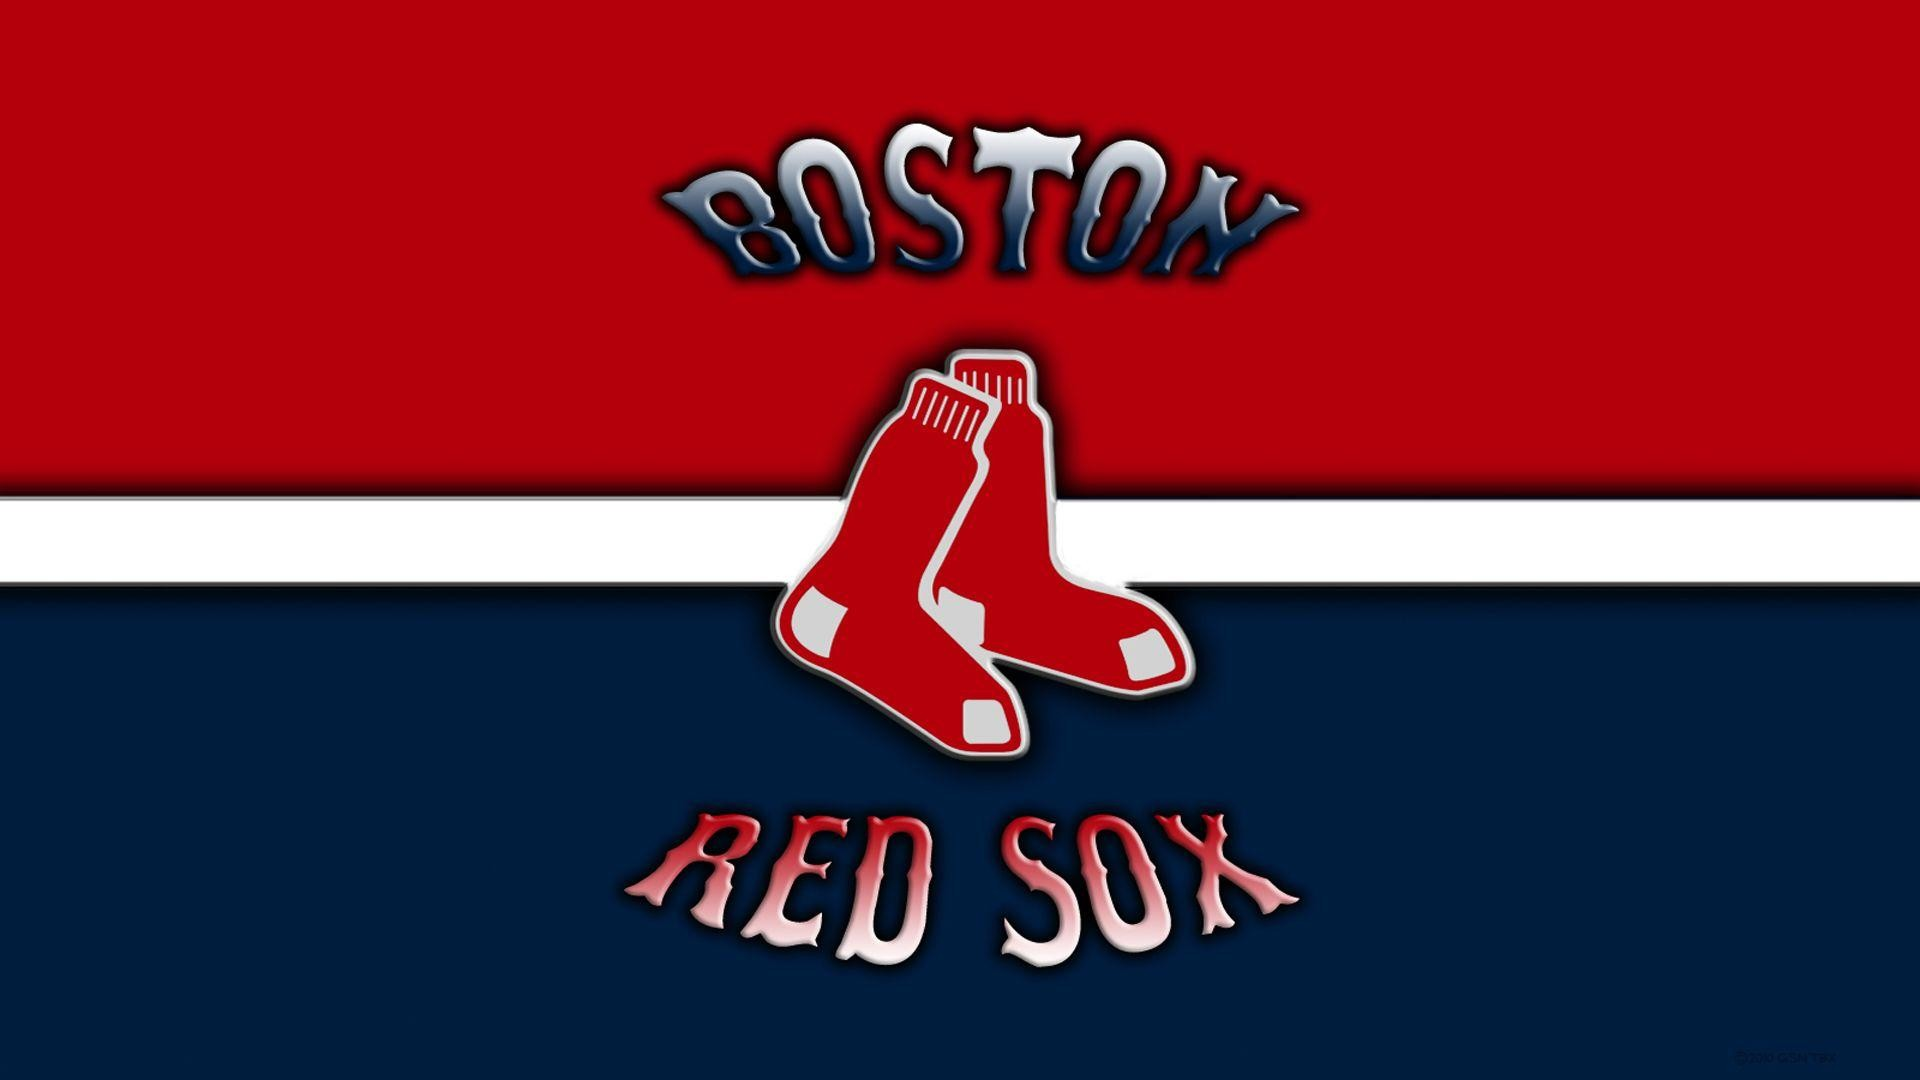 Boston Red Sox Logo on Wood iPhone Wallpaper | Retina iPhone .